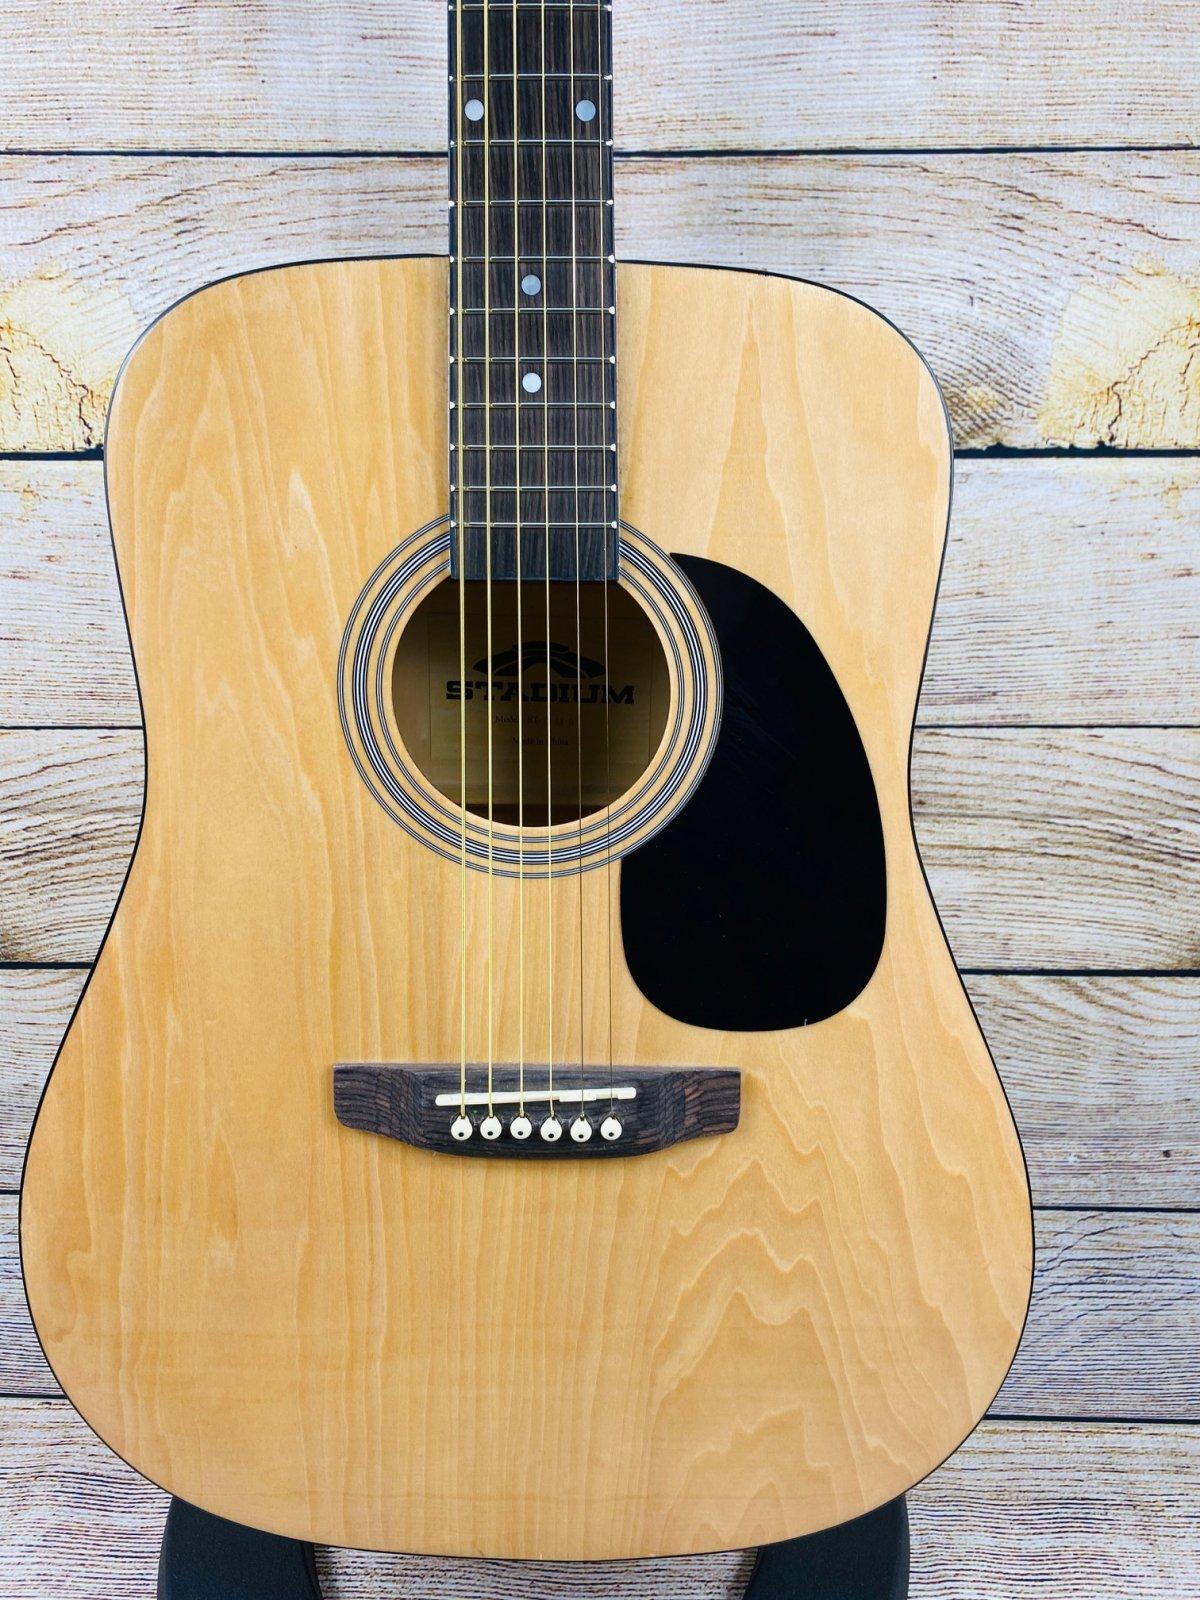 Stadium D-42 Steel String Acoustic Guitar, Natural